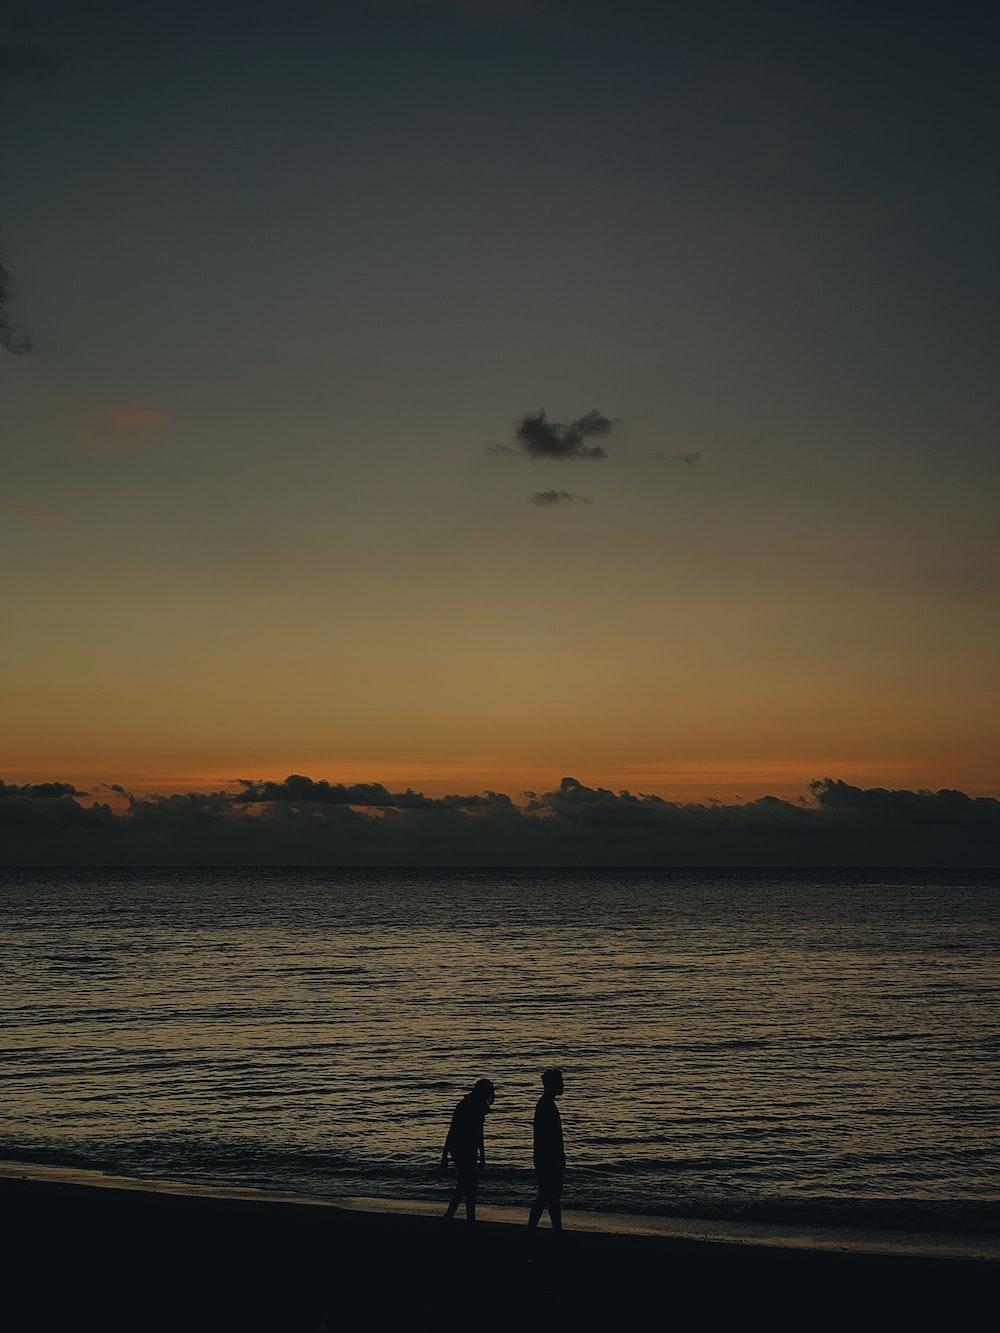 two person walking on seashore